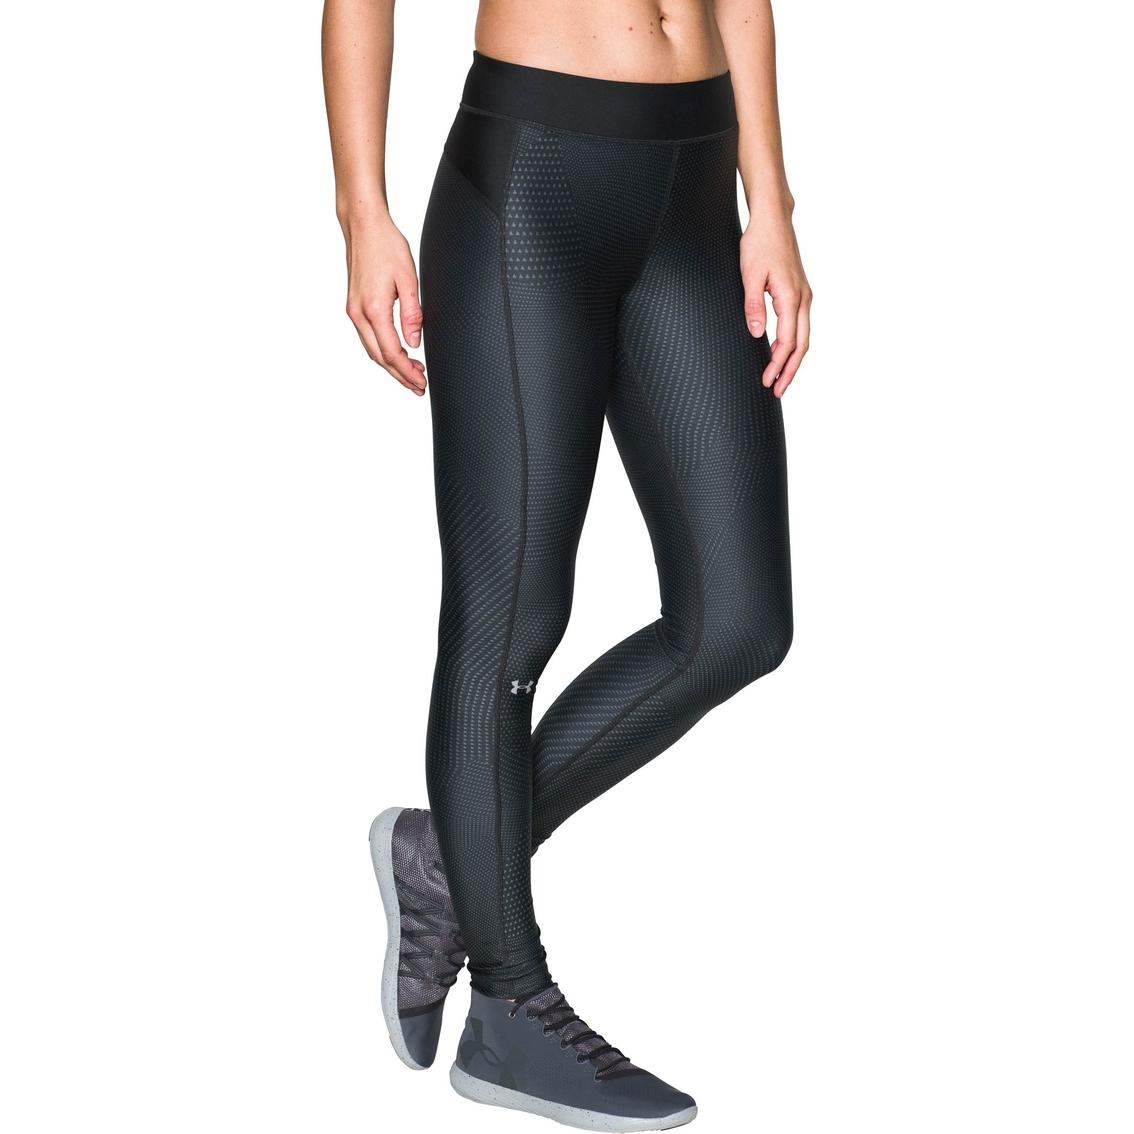 9424745b69fd5 Under Armour Women's Ua Heatgear Armour Printed Leggings | Pants ...